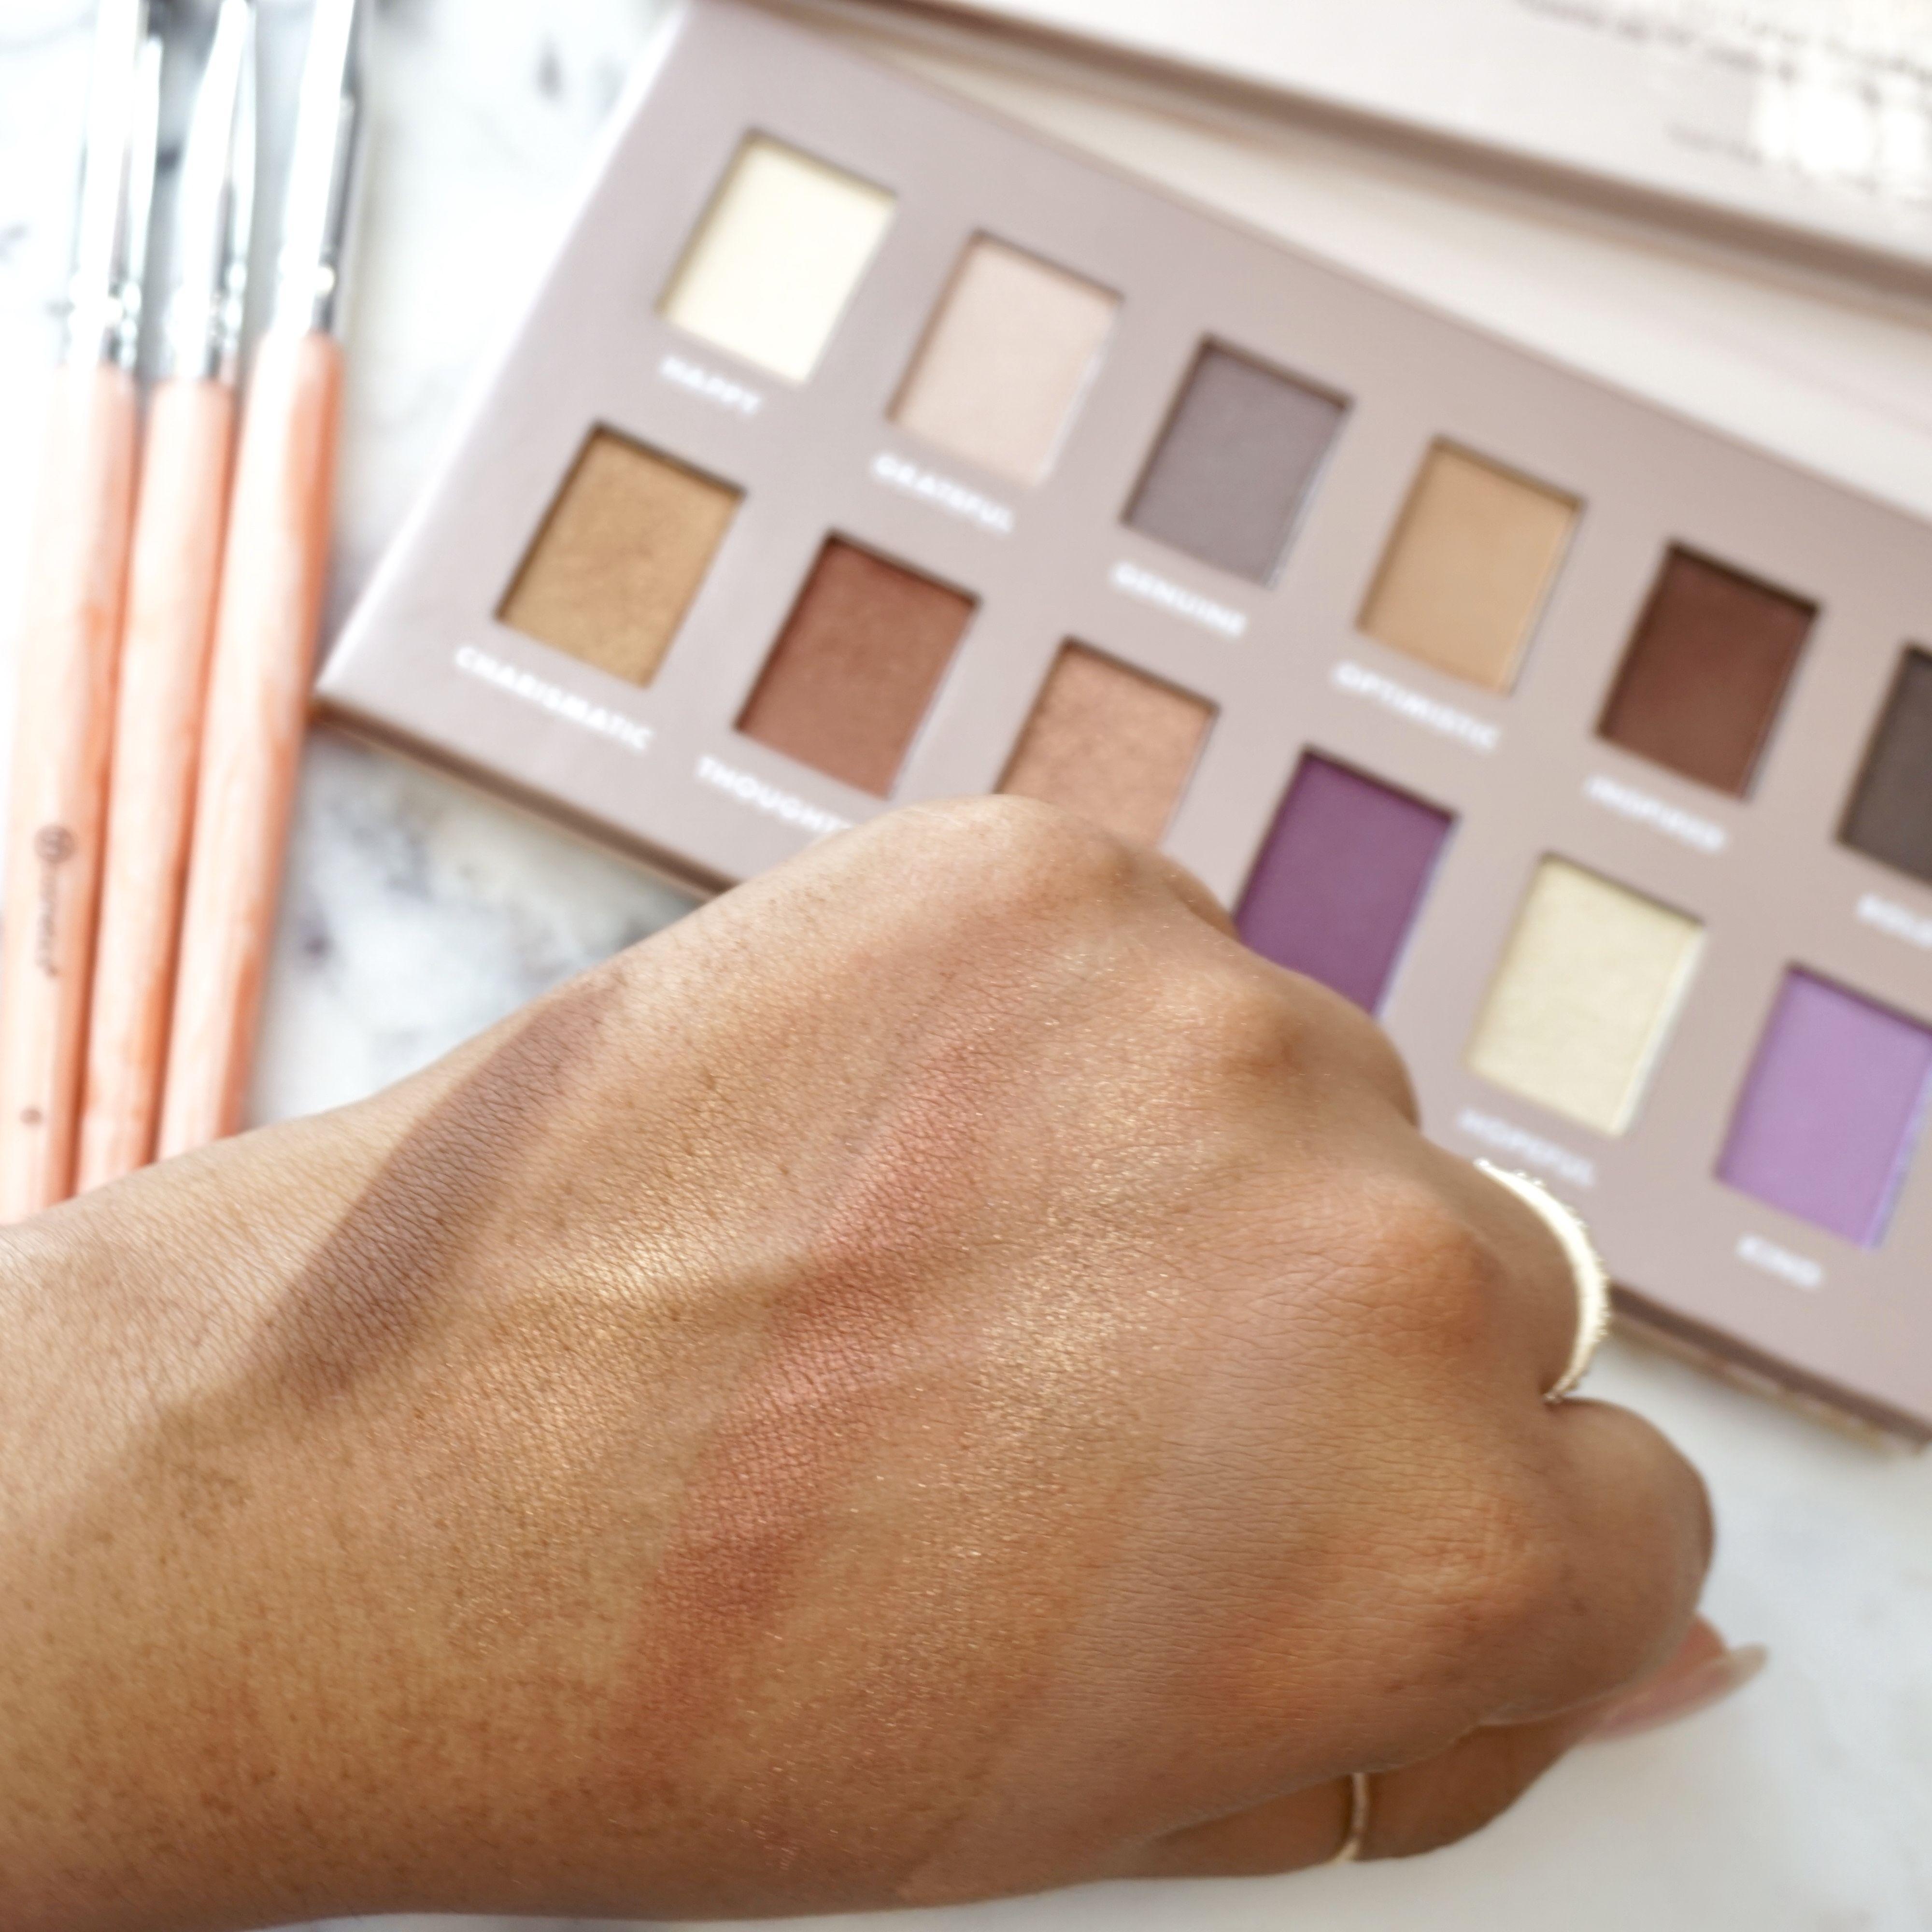 BH Cosmetics Be...by BudzBeauty Eyeshadow Palette Bh